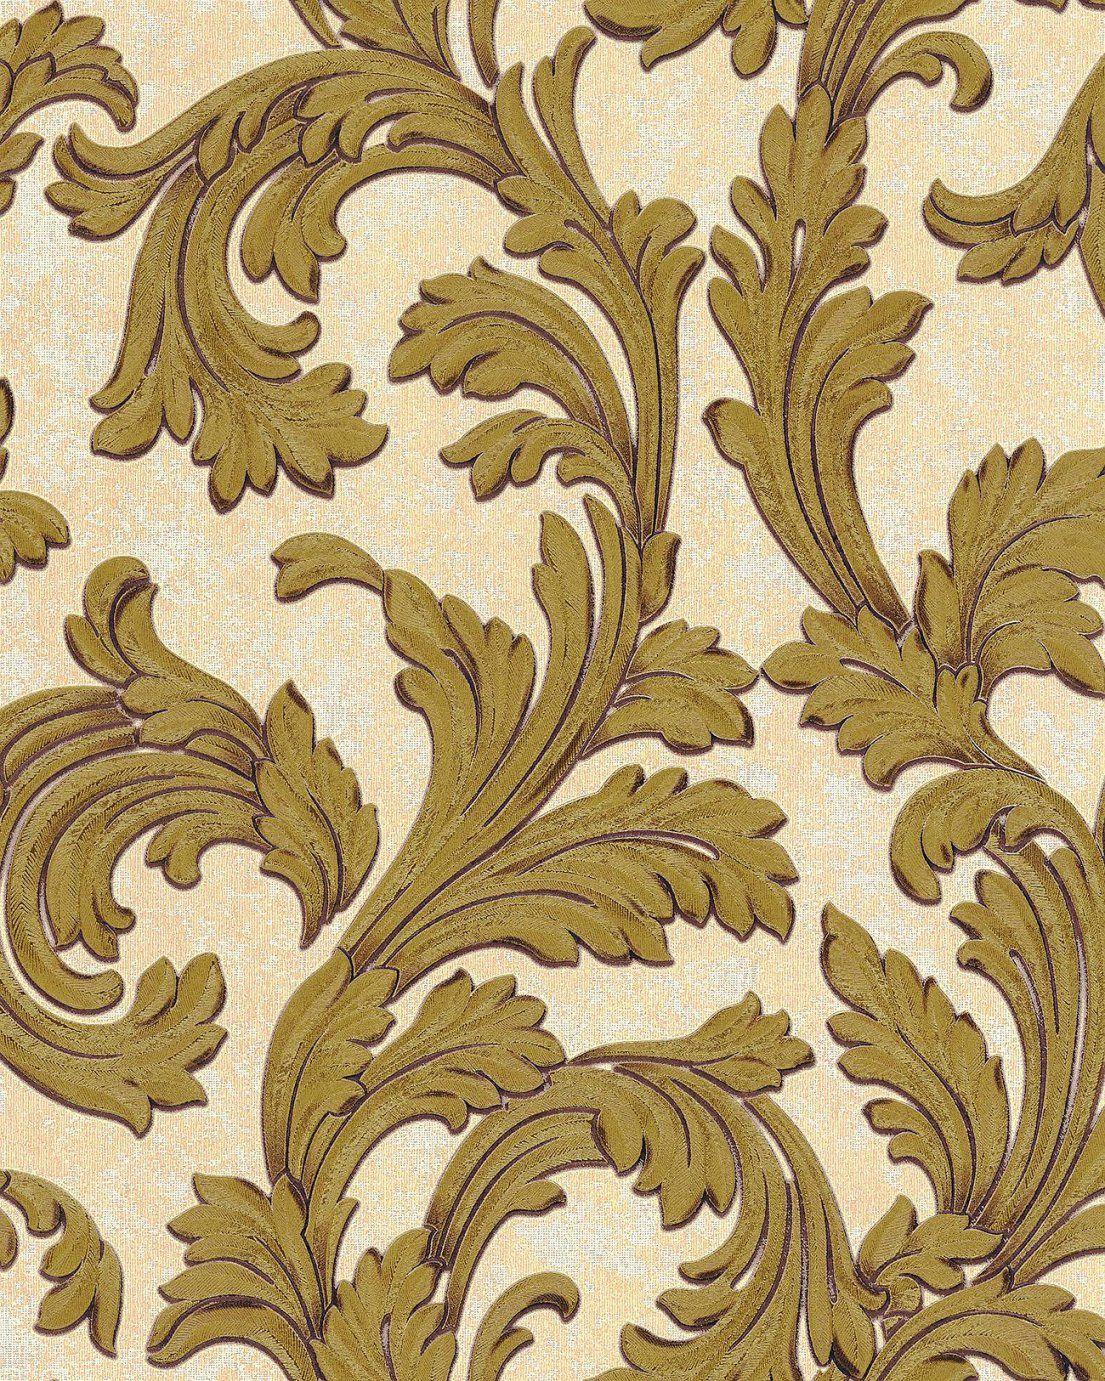 Edem 103211 Barock Tapete Ornament Glitzernd Elfenbein Weiß Gold 5 von Barock Tapete Weiß Gold Photo